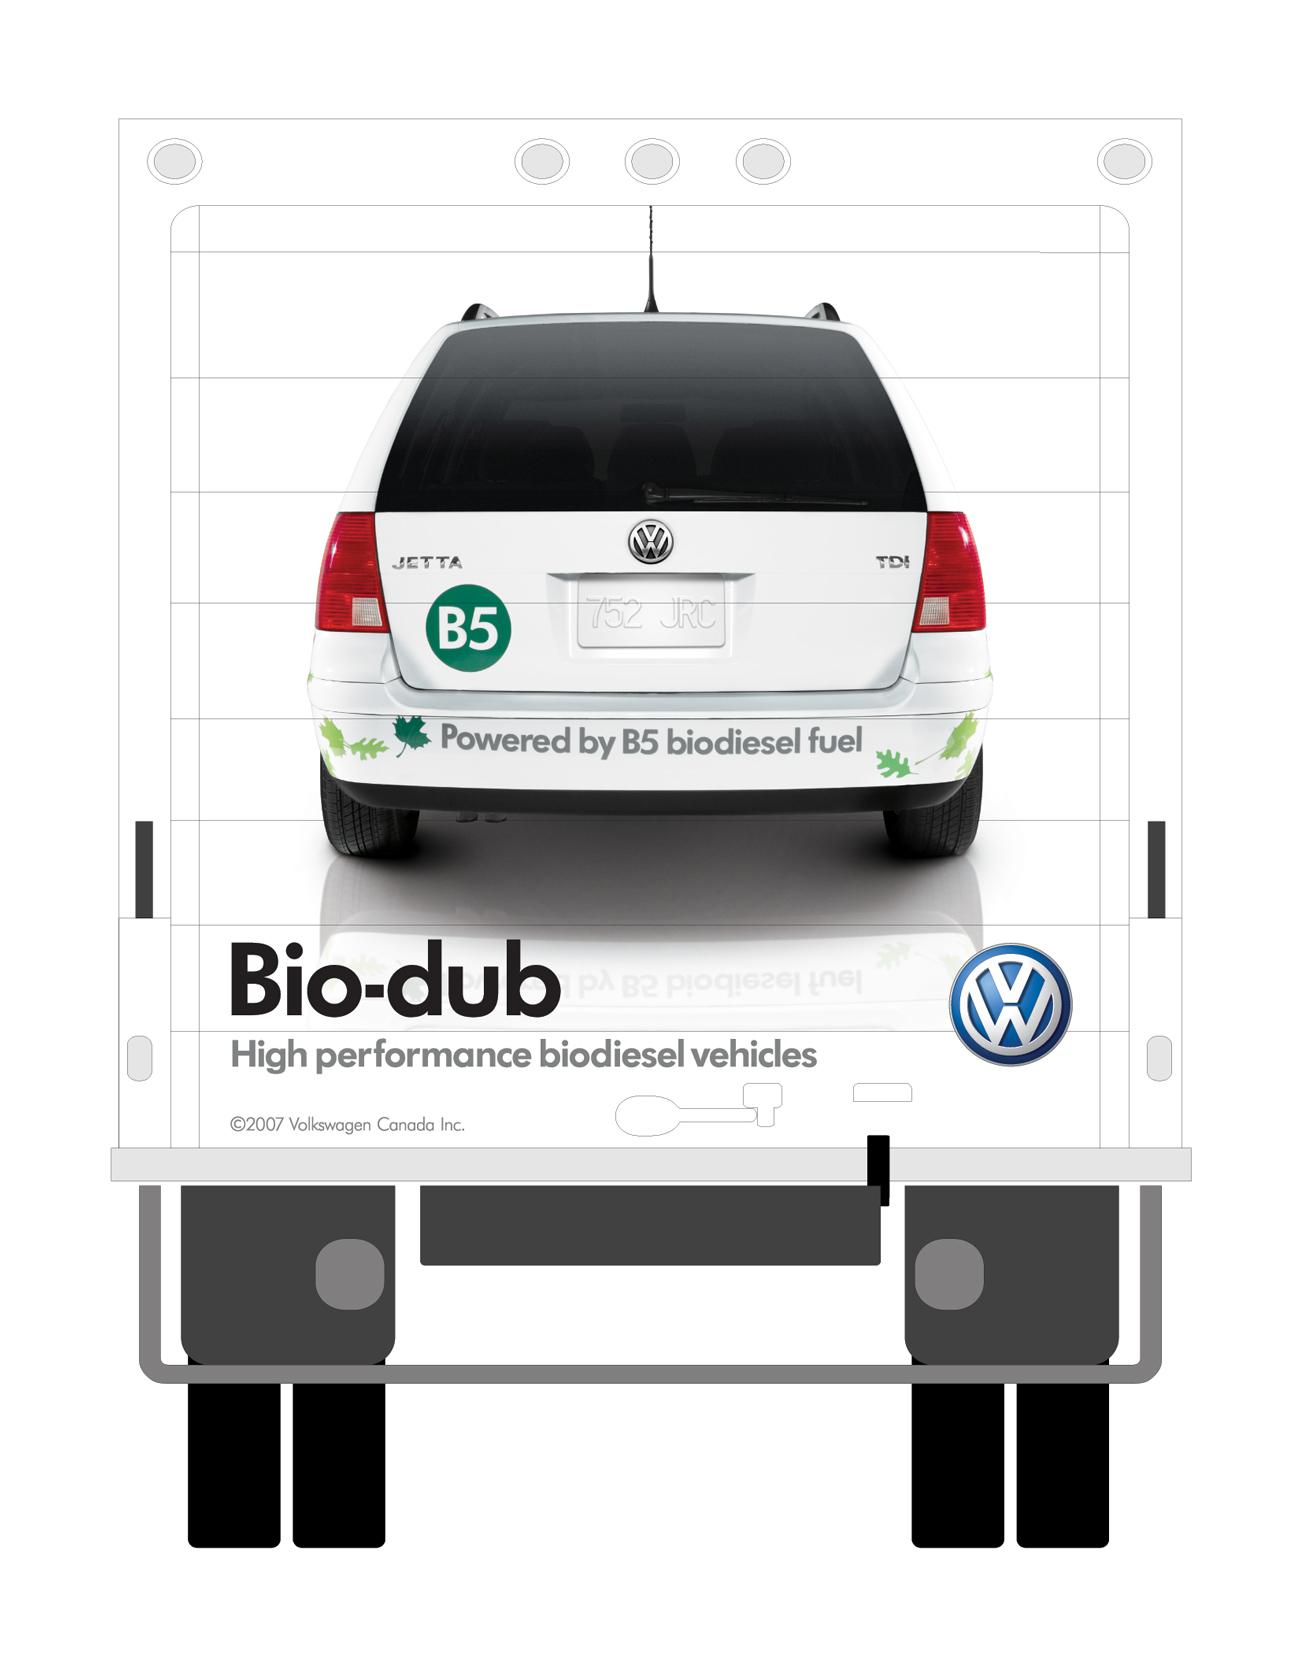 Volkswagen, Jetta BioDiesel TDI, rear view Client: Crispin, Porter + Bogusky